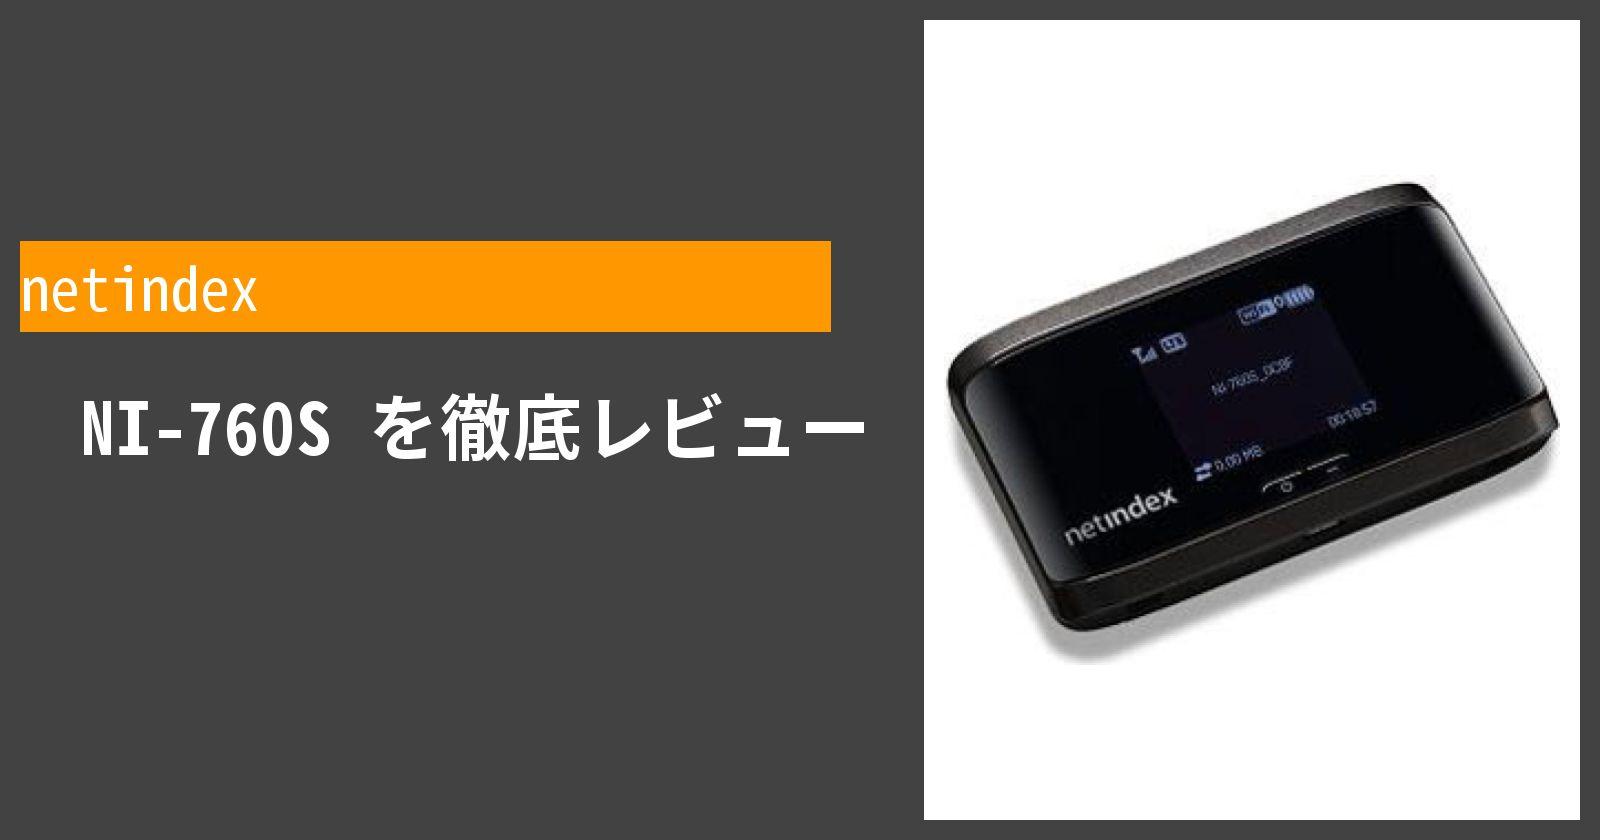 NI-760Sを徹底評価